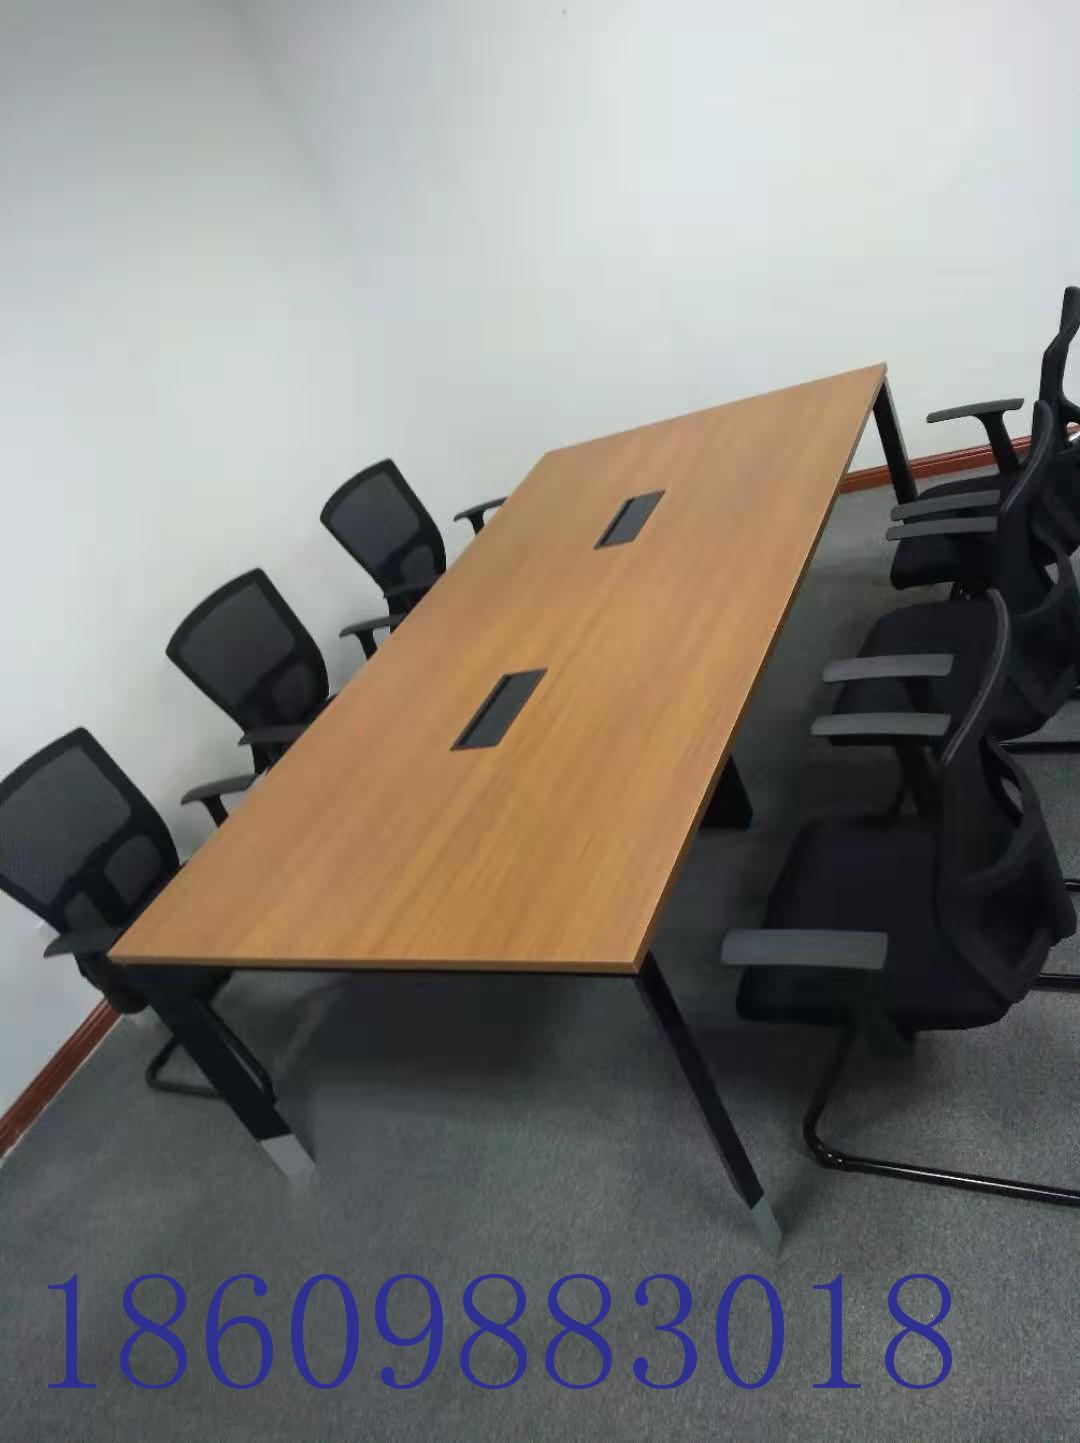 yabo88wap下载亚博体育办公家具,经理办公桌,会议台钢架